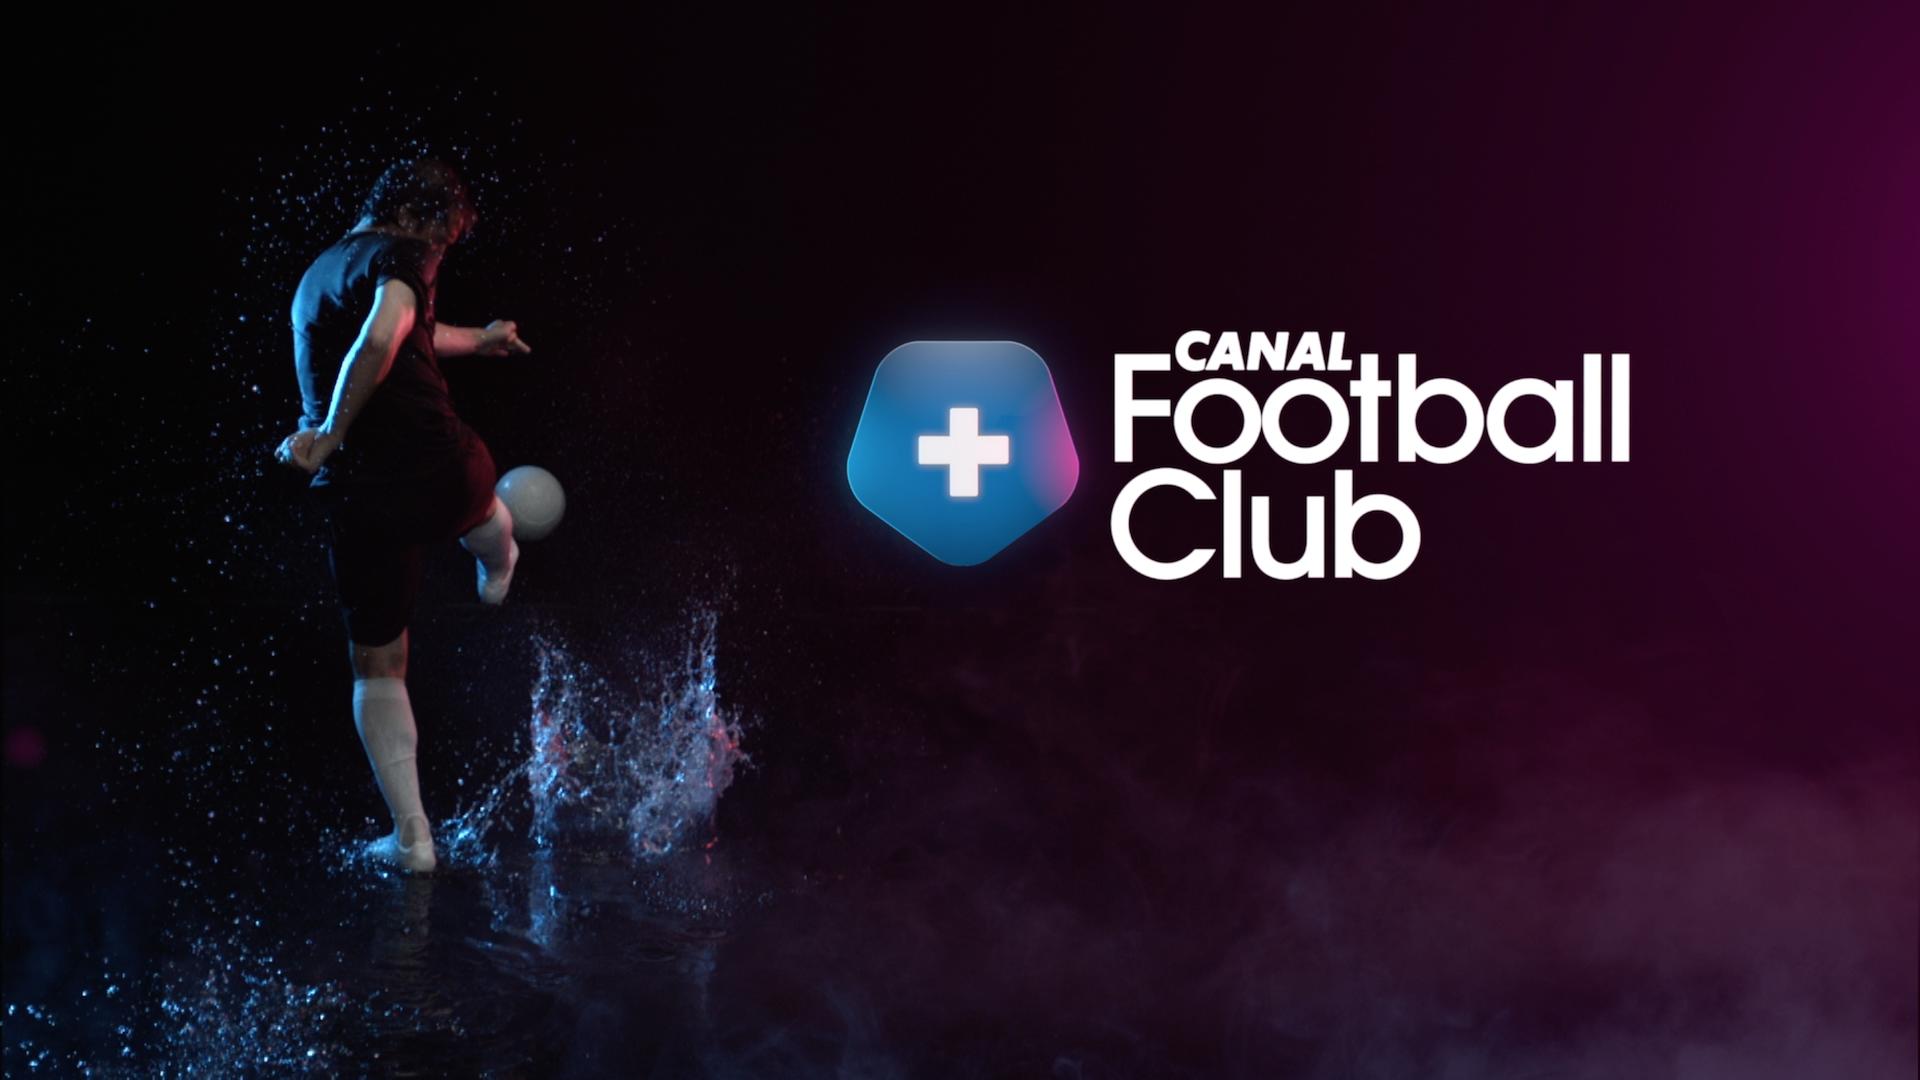 canalFootballClub